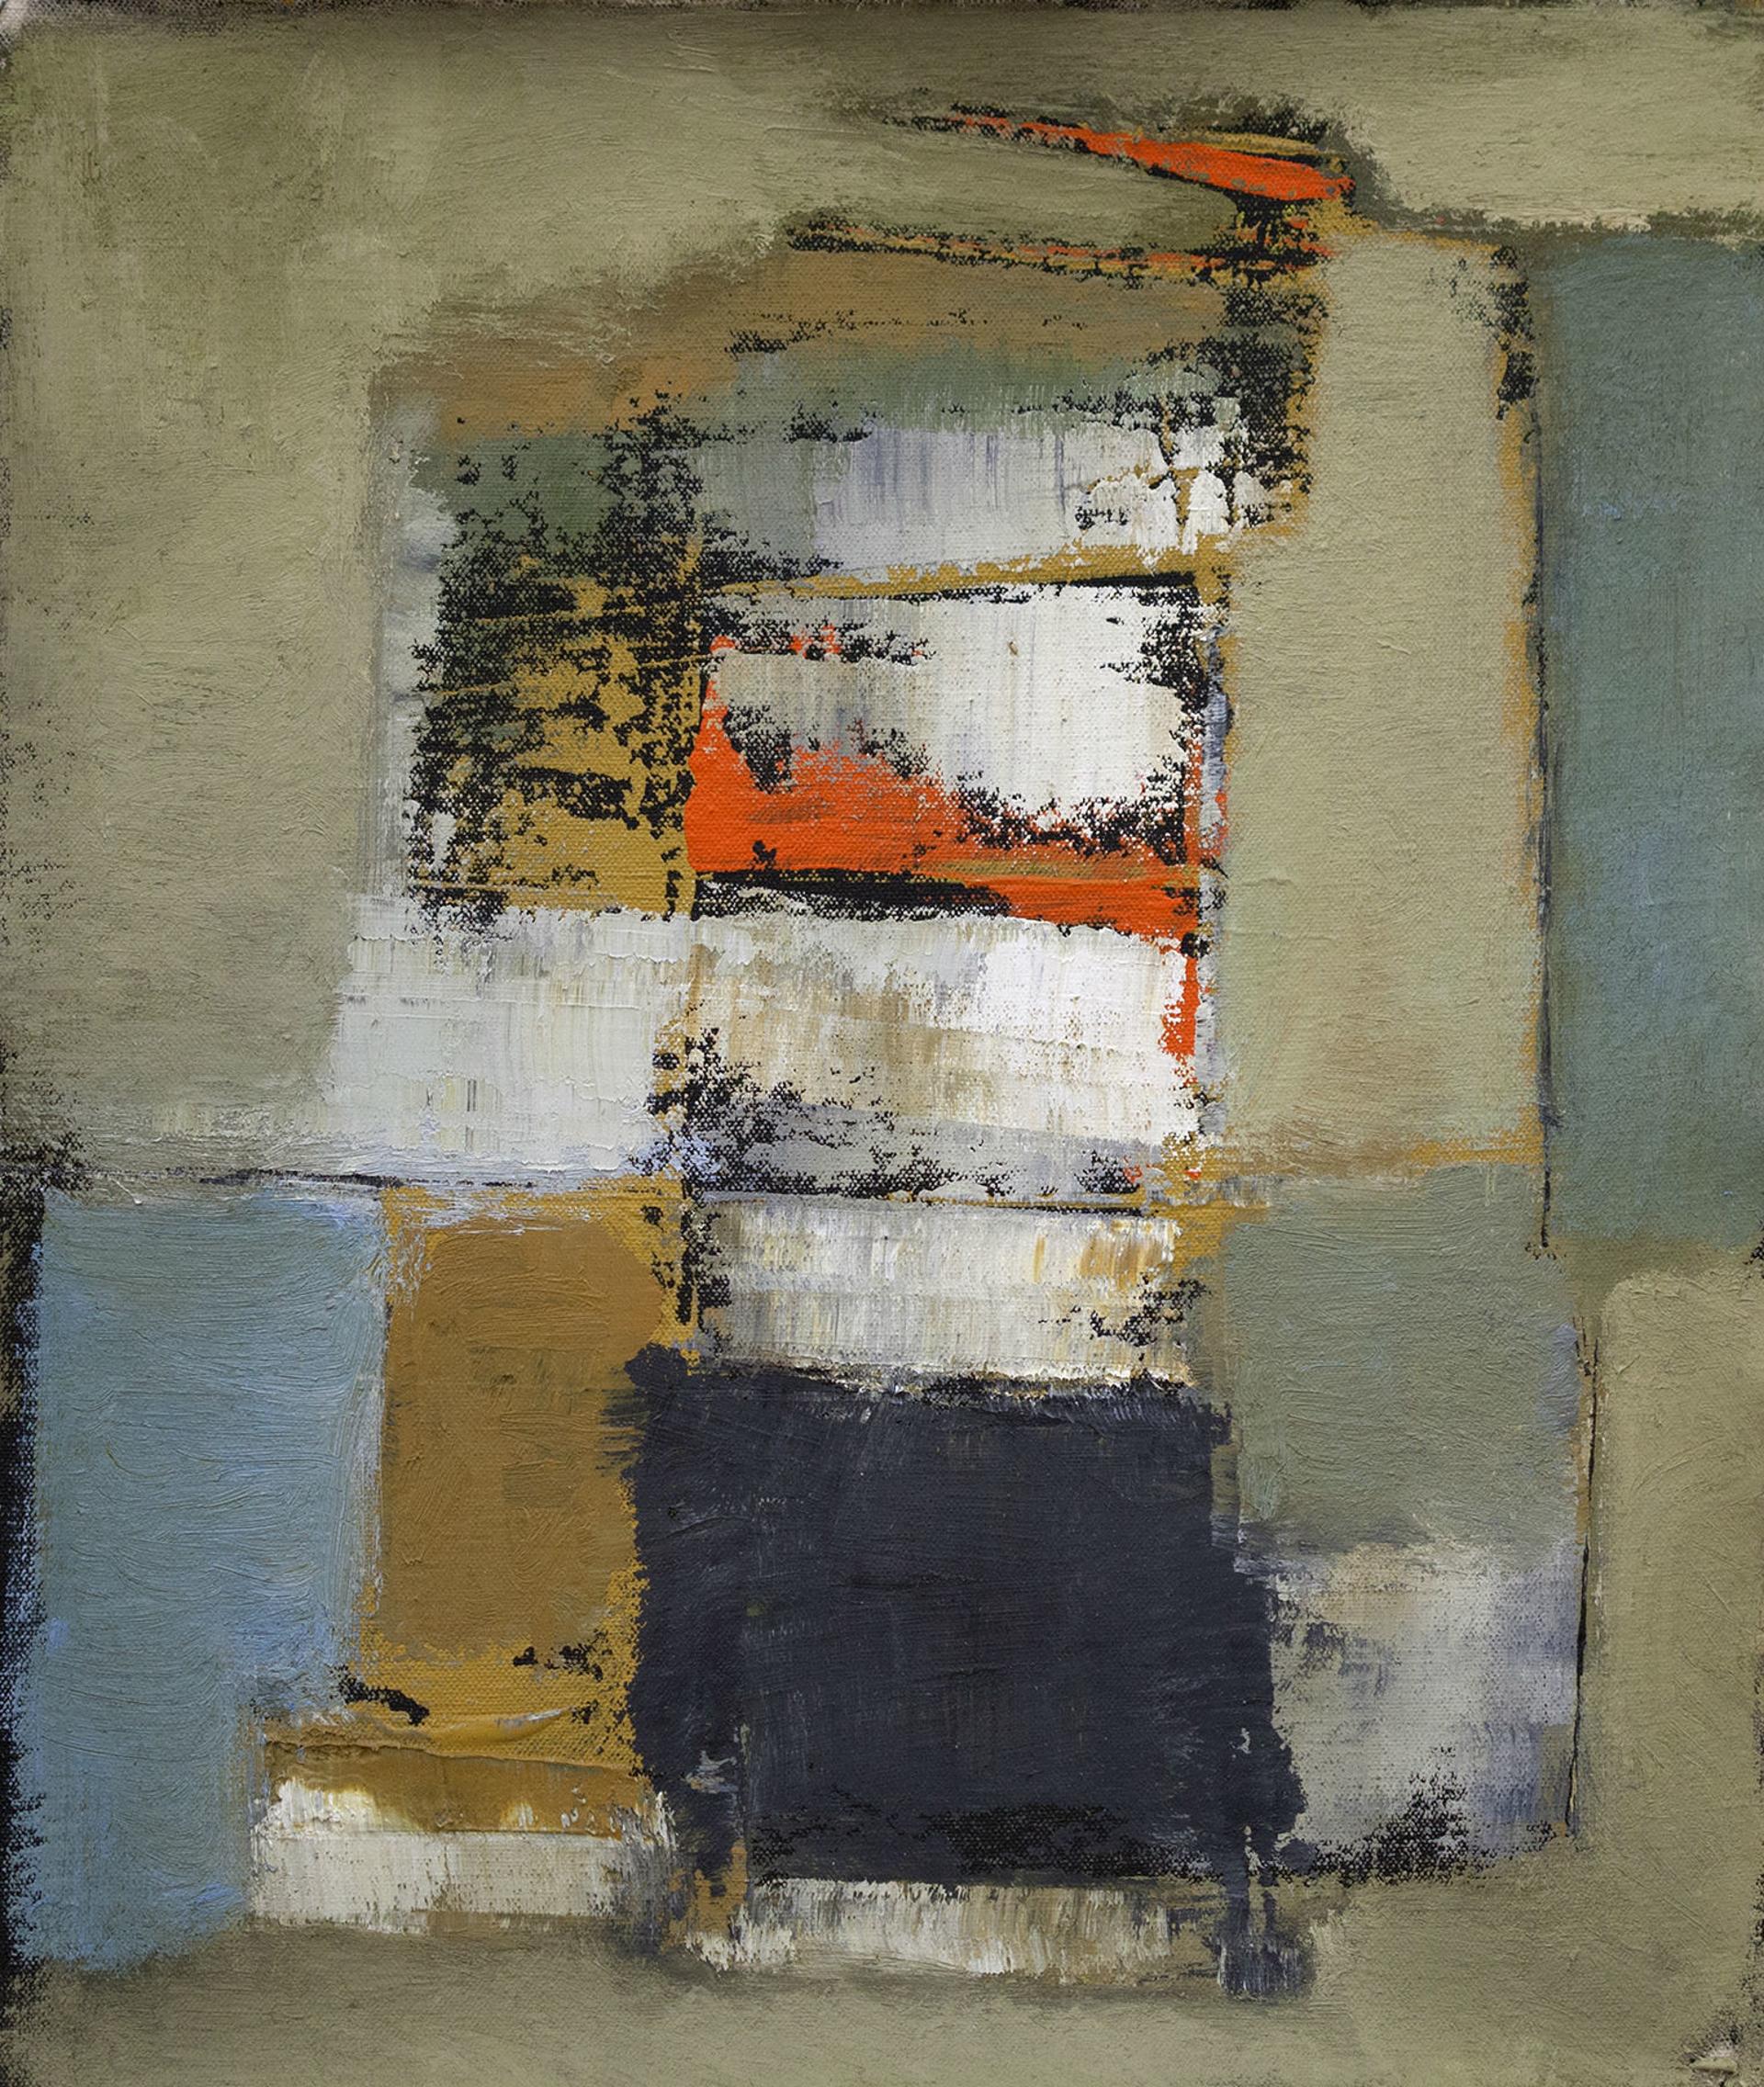 Patchwork by John McCaw